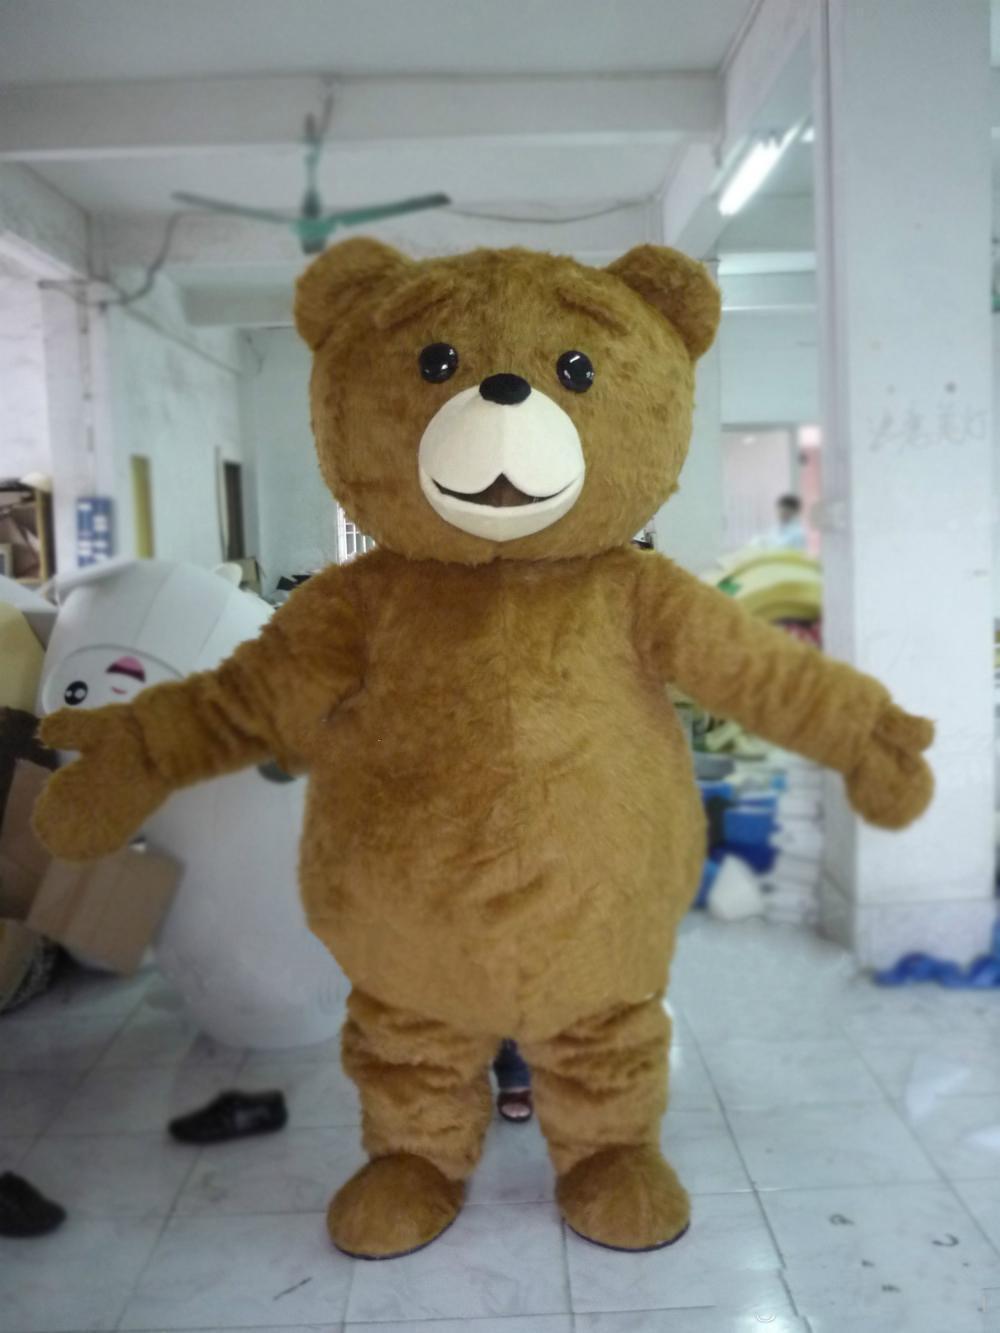 2018 Factory sale hot Mascot Adult size Cartoon long plush ted brown bear Mascot Costume mascot halloween costume christmas Crazy Sa